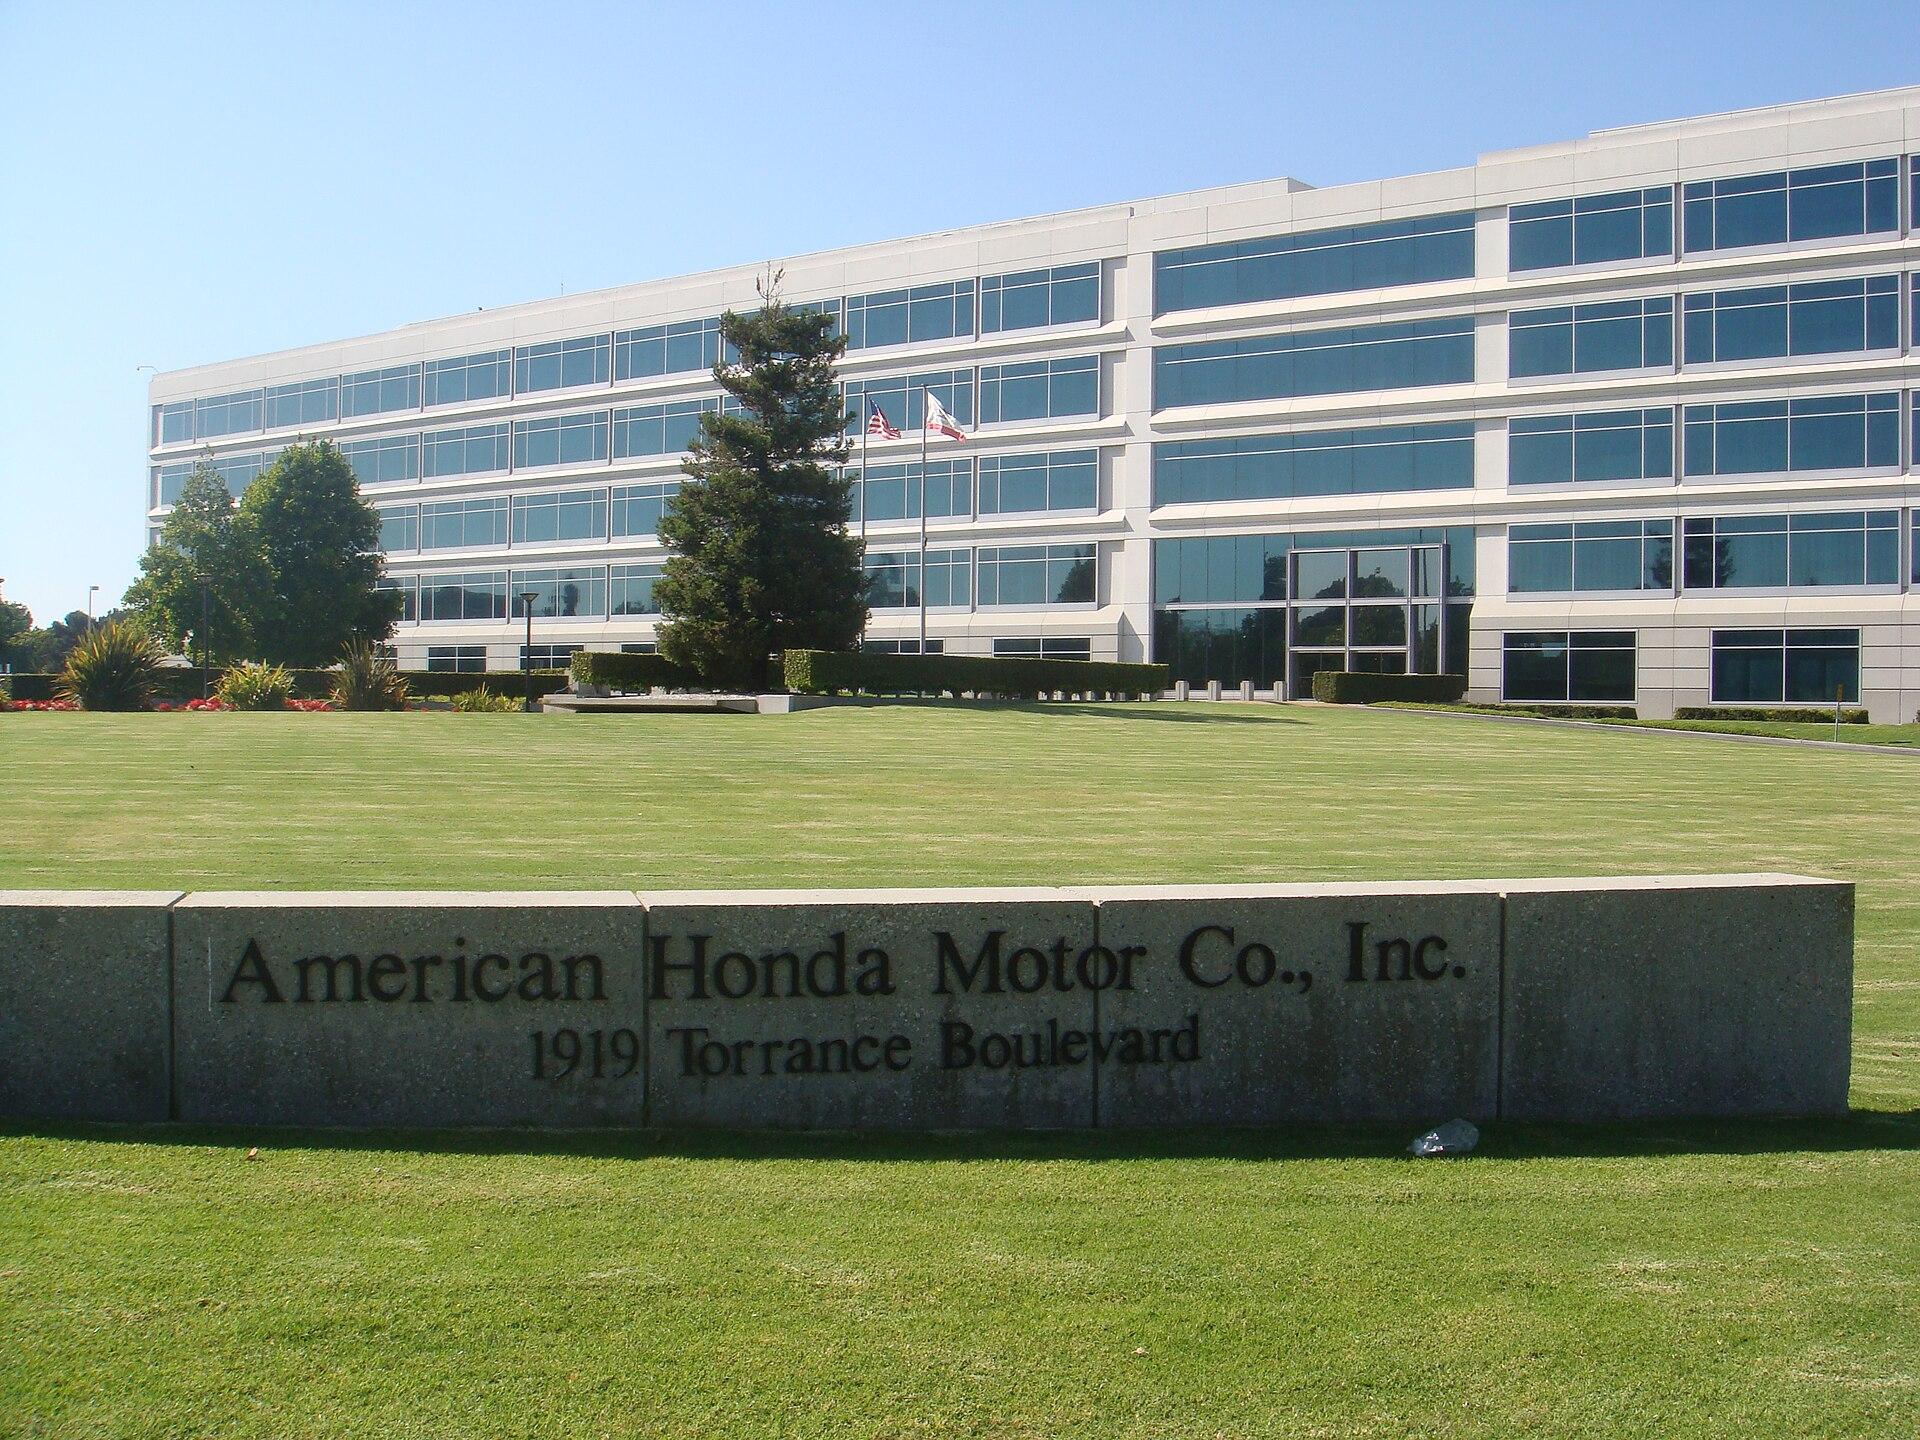 American honda motor company wikipedia for American honda motor co